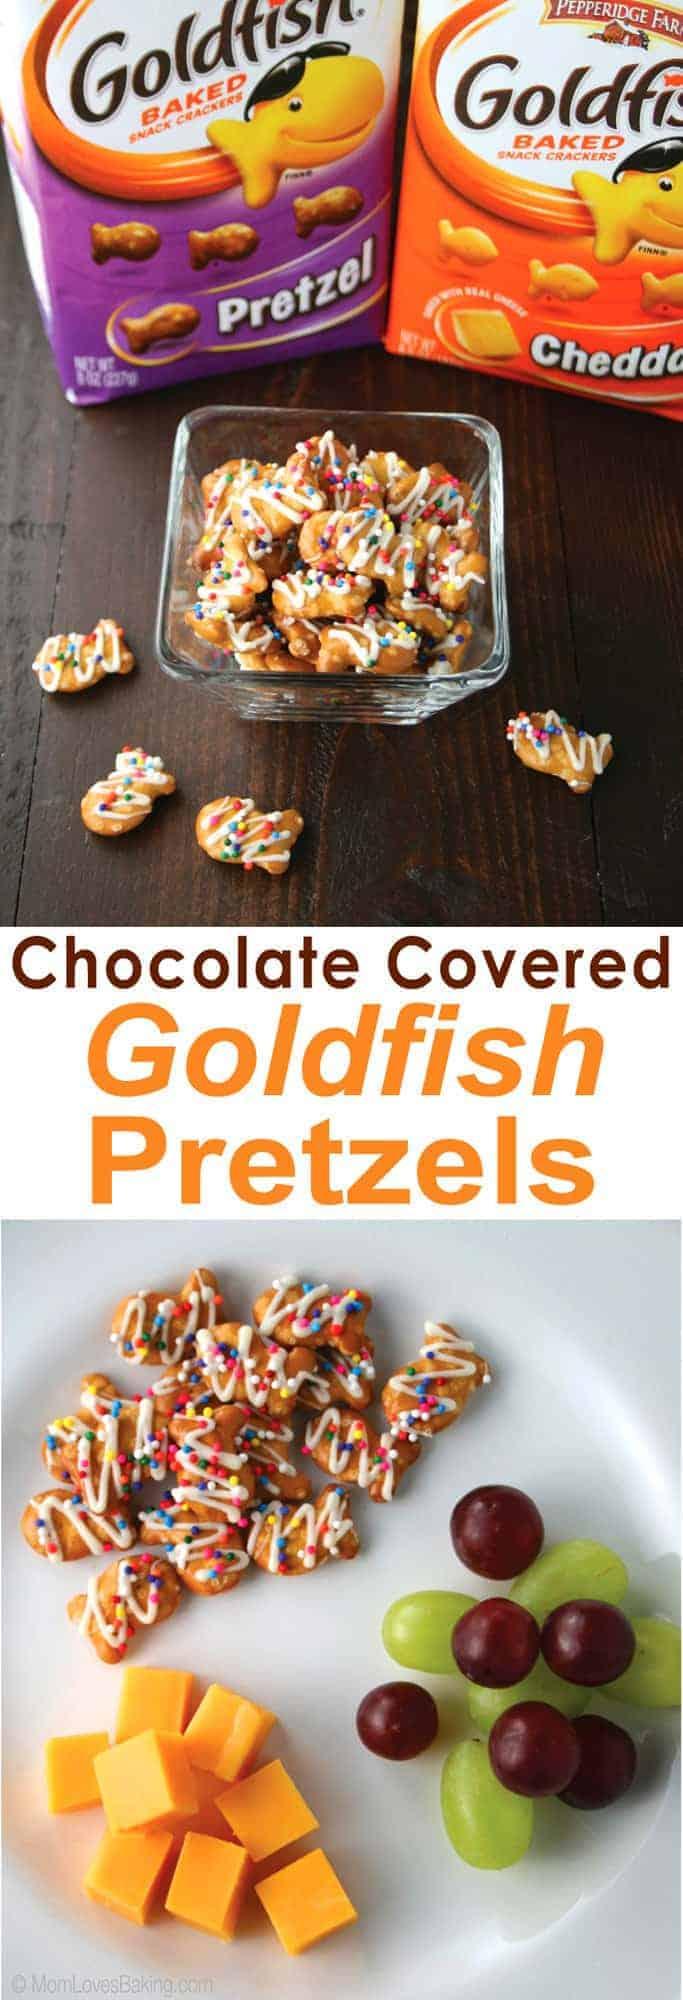 Chocolate Covered Goldfish Pretzels